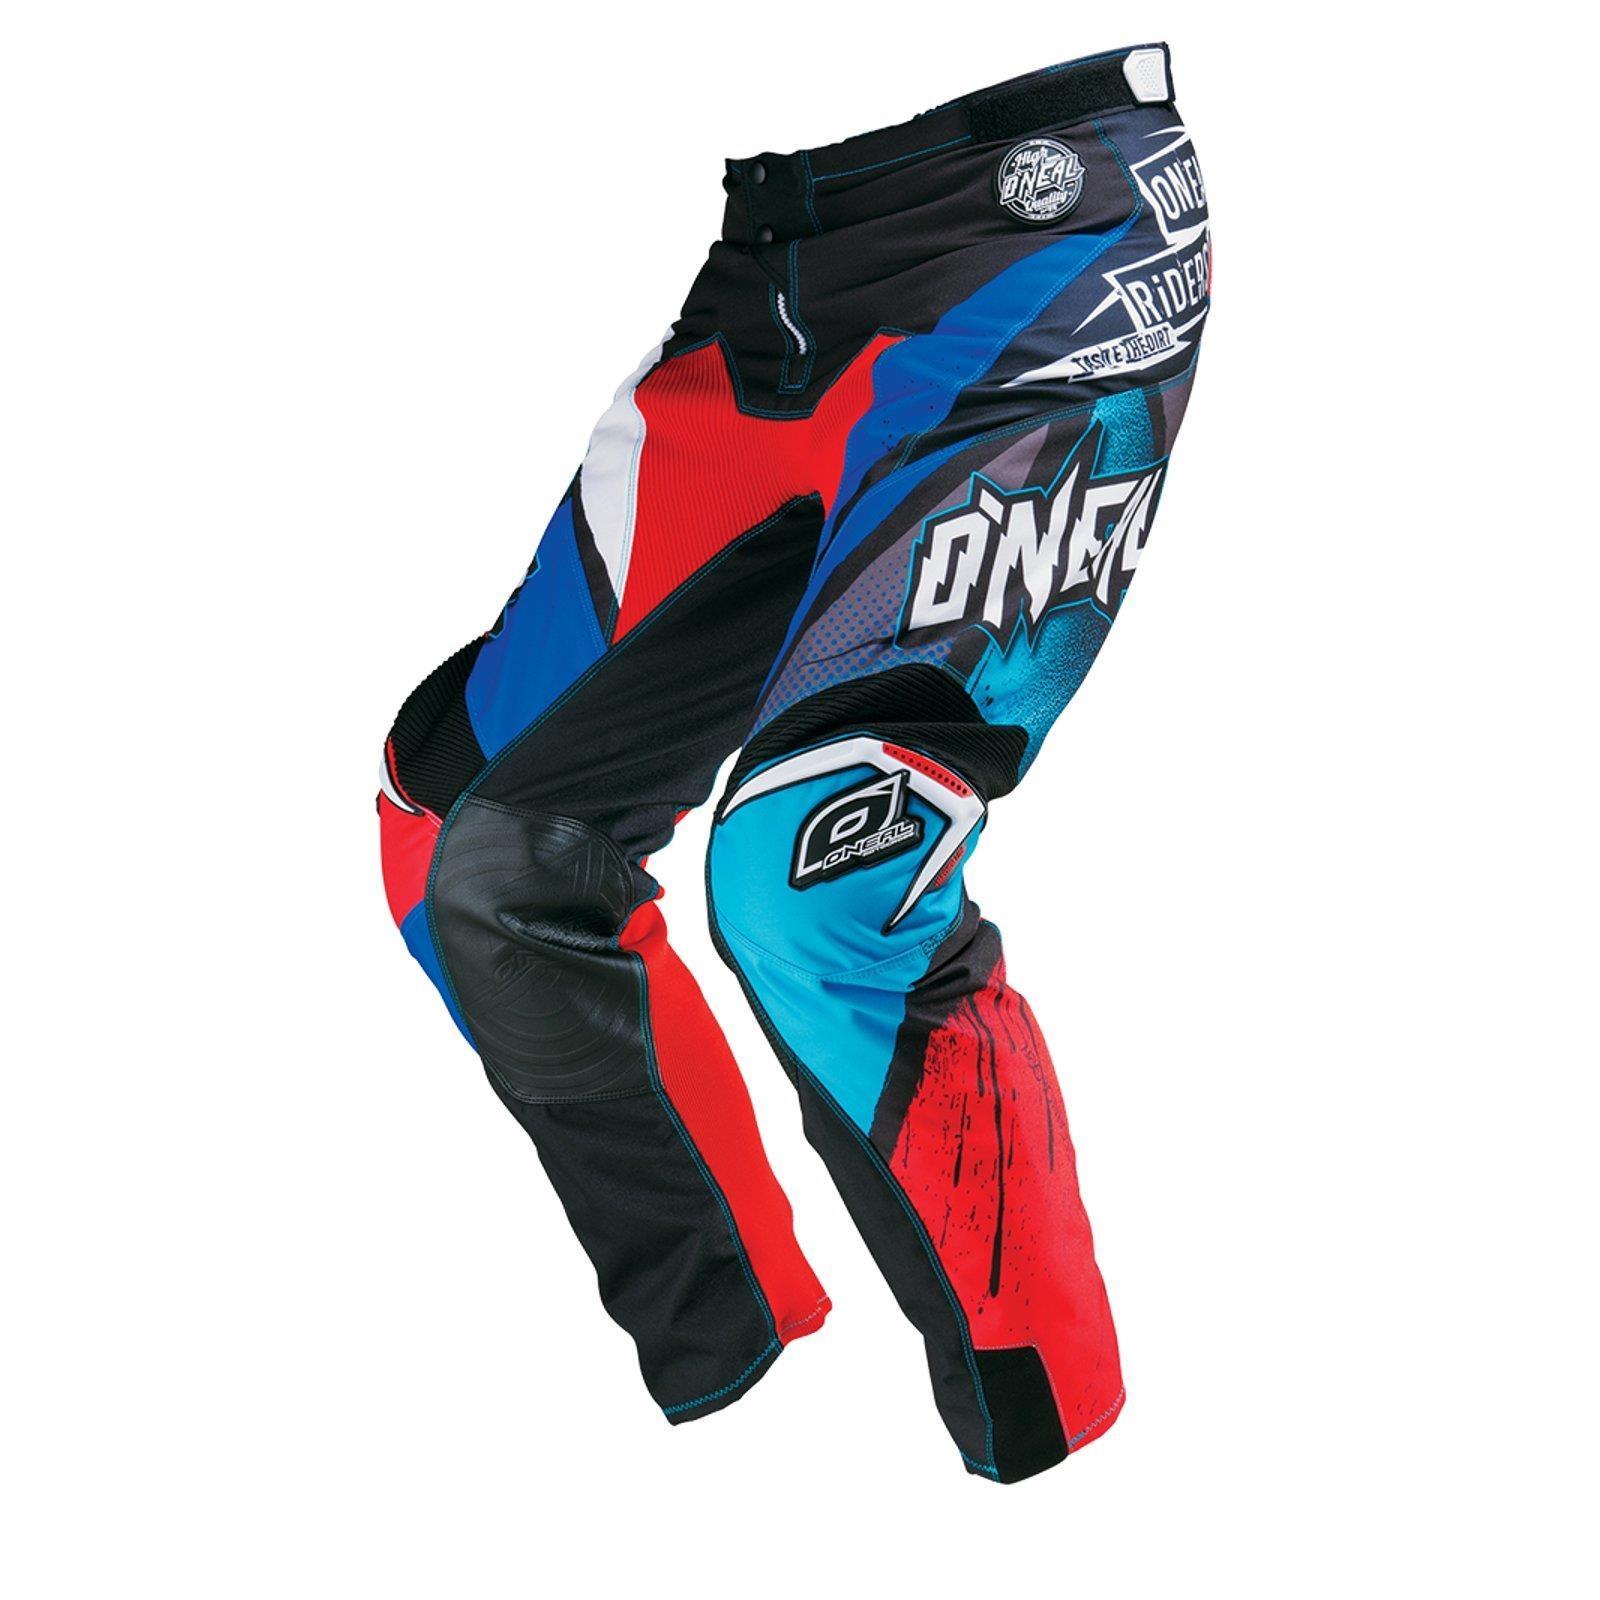 O-039-neal-elemento-Mayhem-Hardwear-Pants-pantalones-MX-Moto-Cross-Enduro-todoterreno-cuero miniatura 23